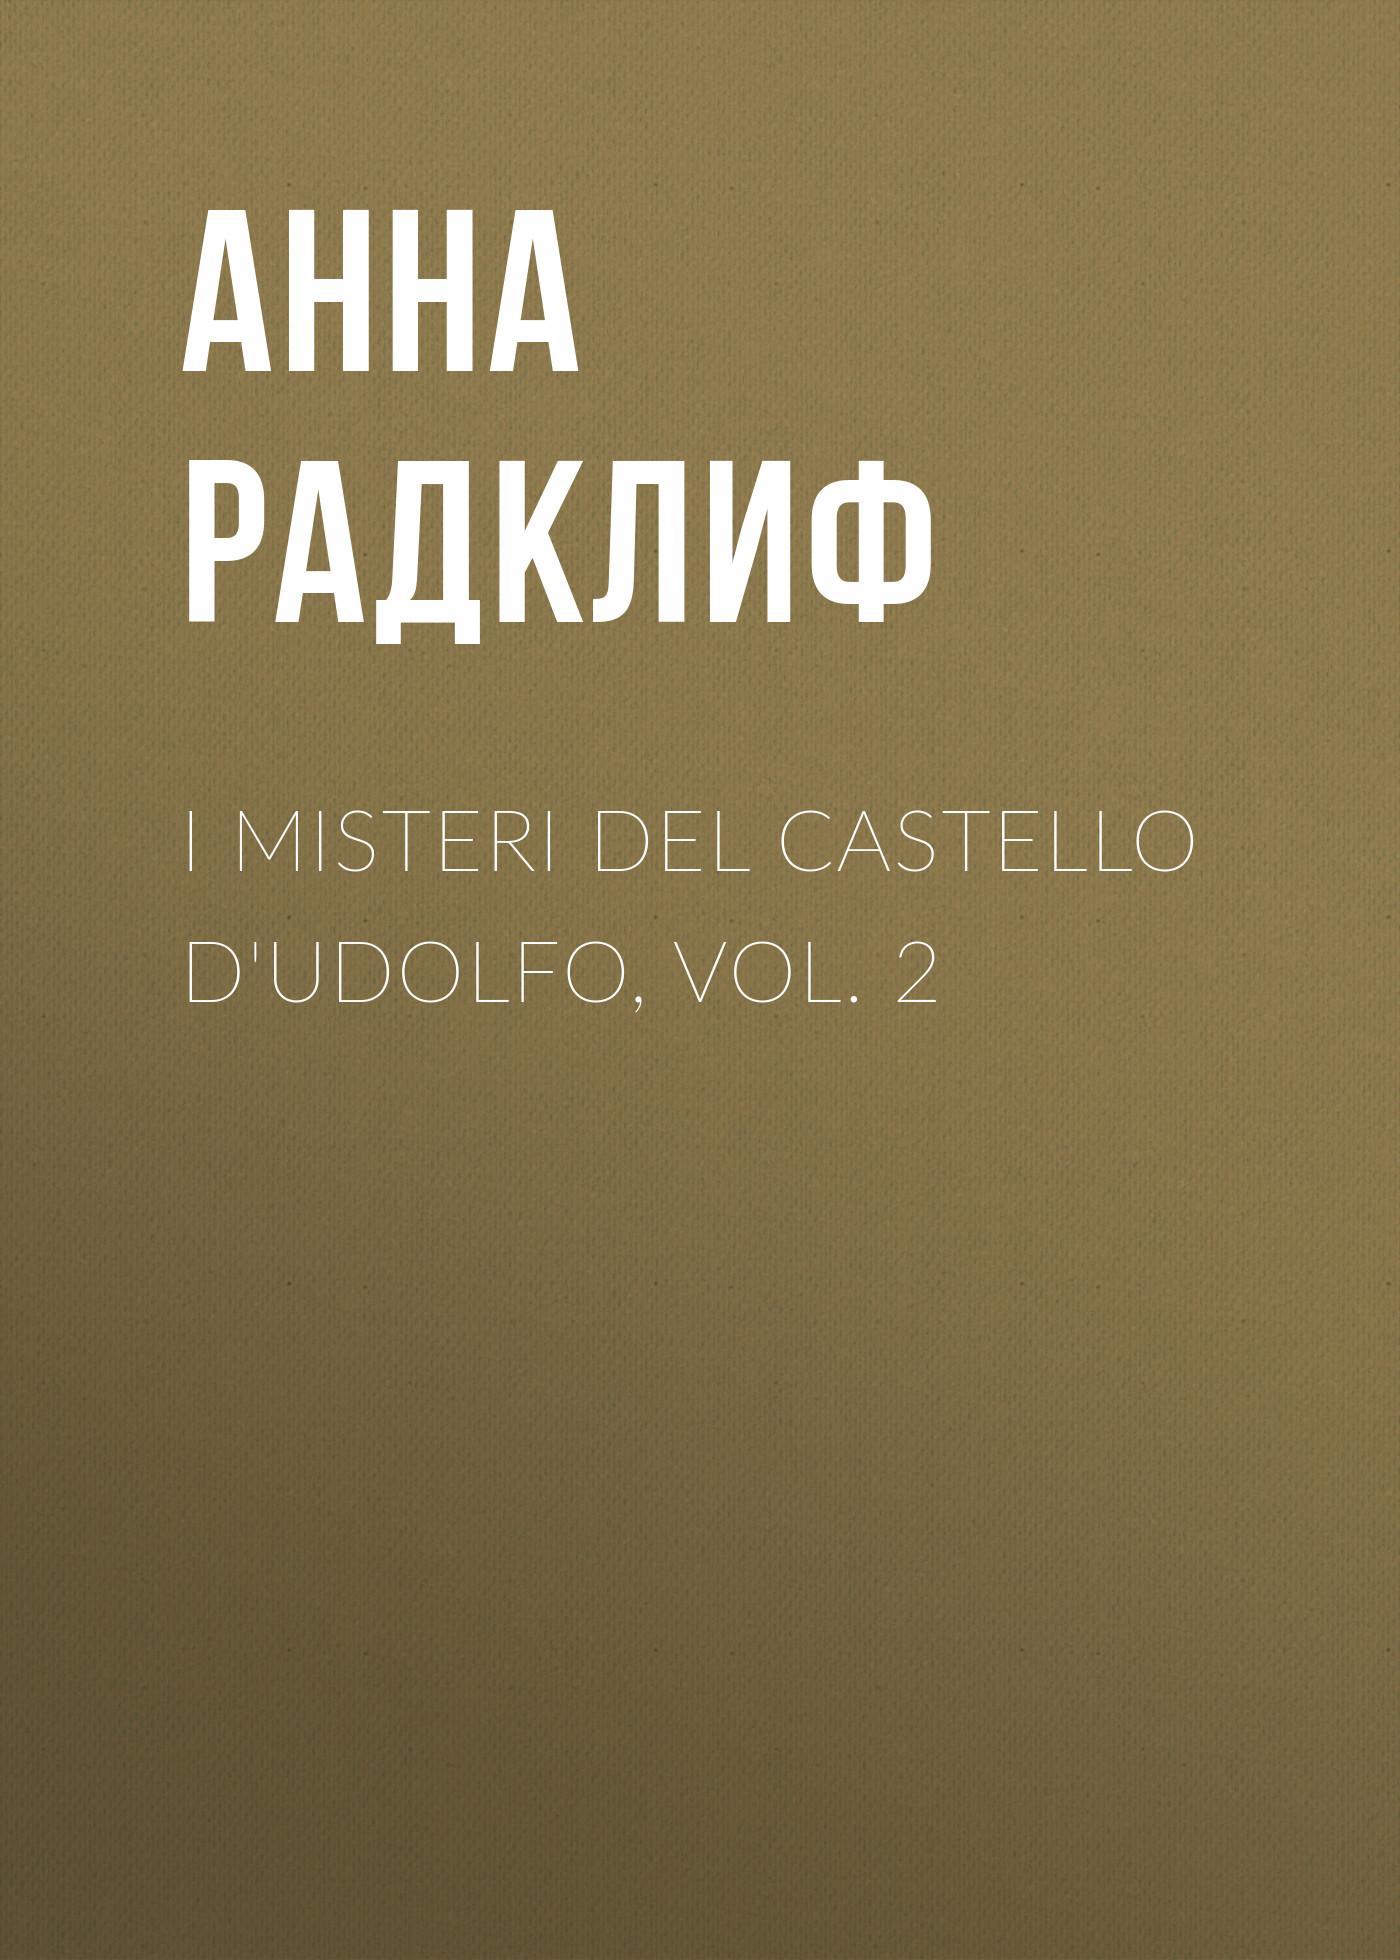 Анна Радклиф I misteri del castello d'Udolfo, vol. 2 antonio cánovas del castillo obras vol 2 estudios del reinado de felipe iv classic reprint